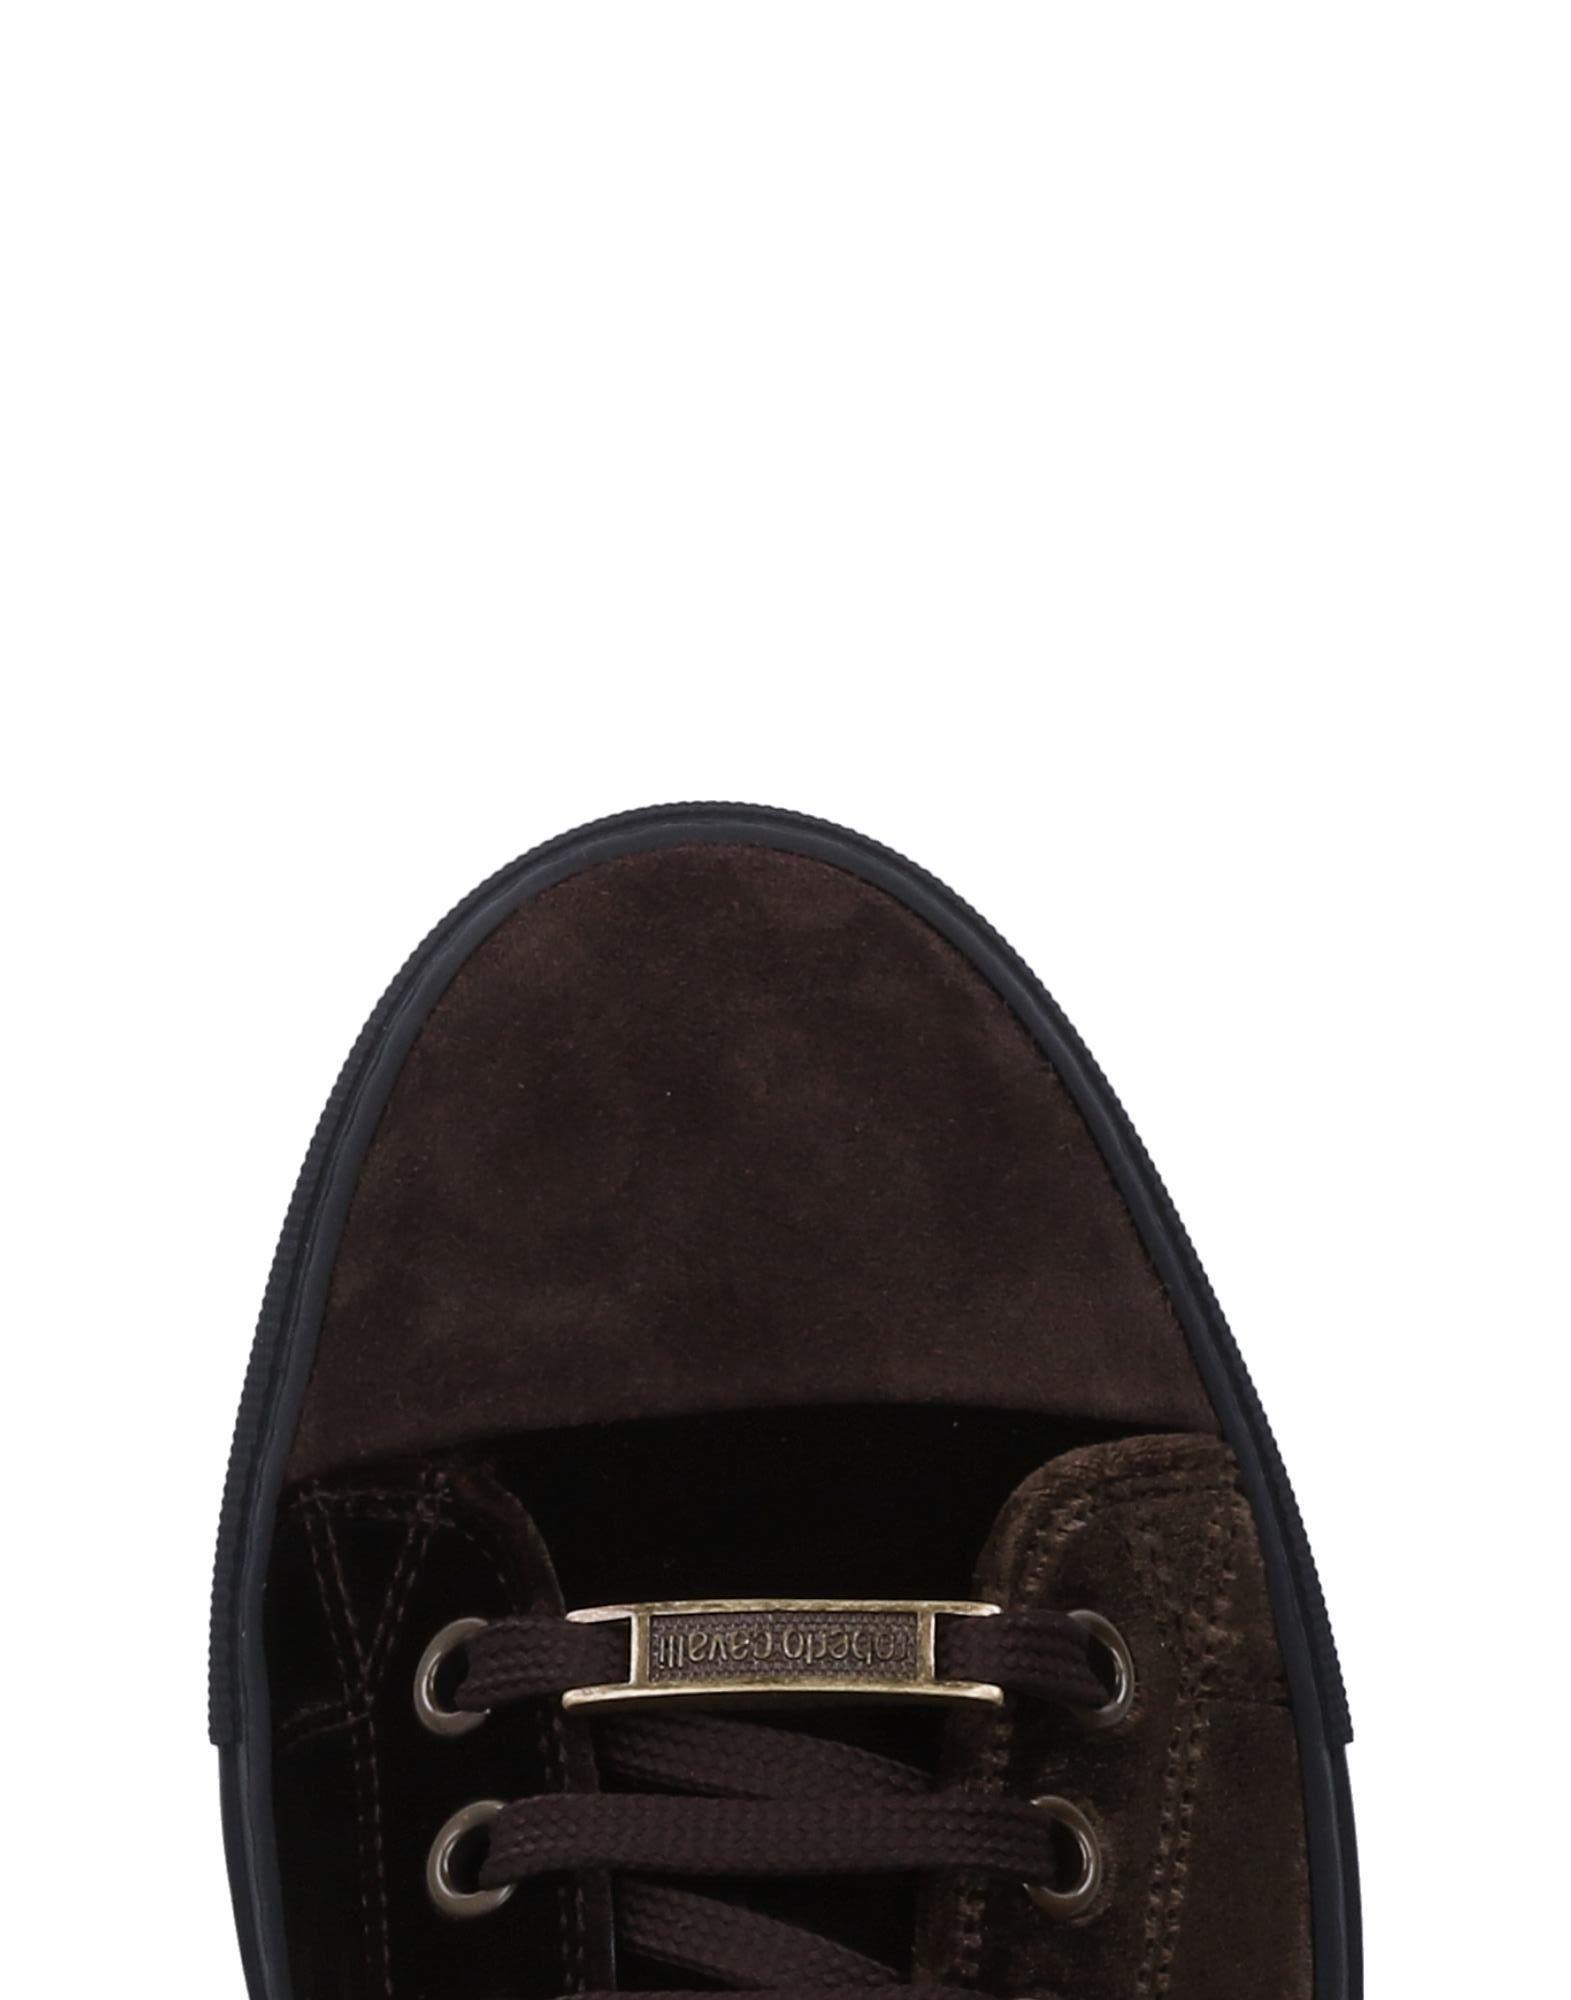 Roberto Cavalli Sneakers Herren  11517364FH Gute Qualität beliebte Schuhe